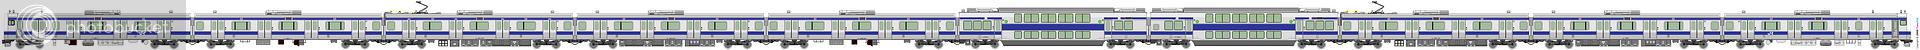 Train 2004